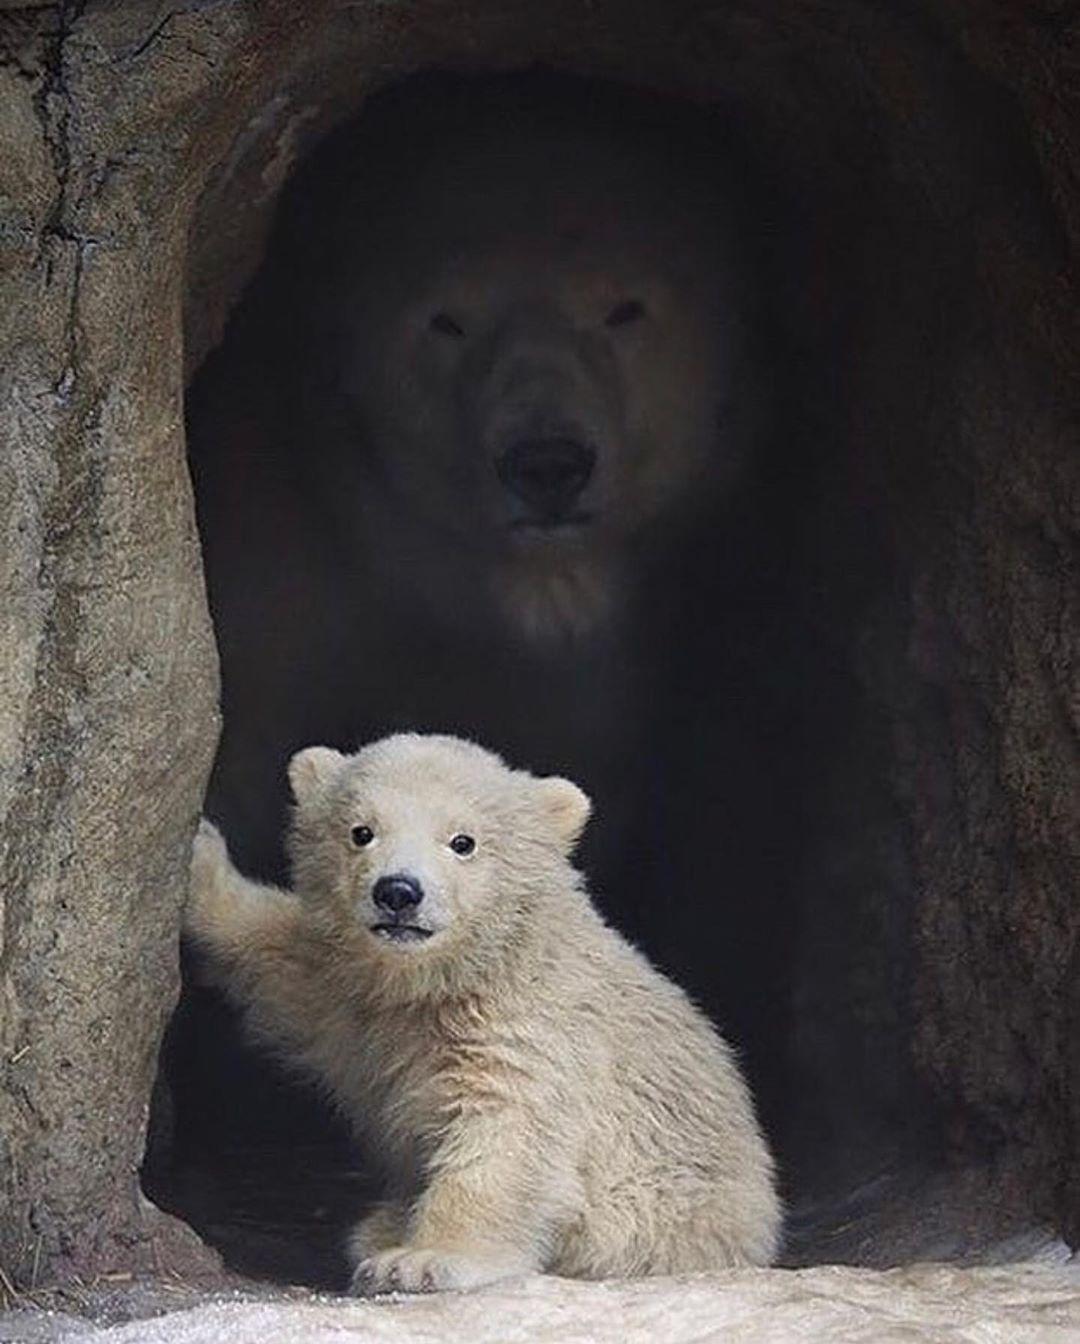 Mama polar bear taking care of her baby ❤️❤️❤️ Photo By: Sergey Gladyshev https://t.co/tCSeuNjphC